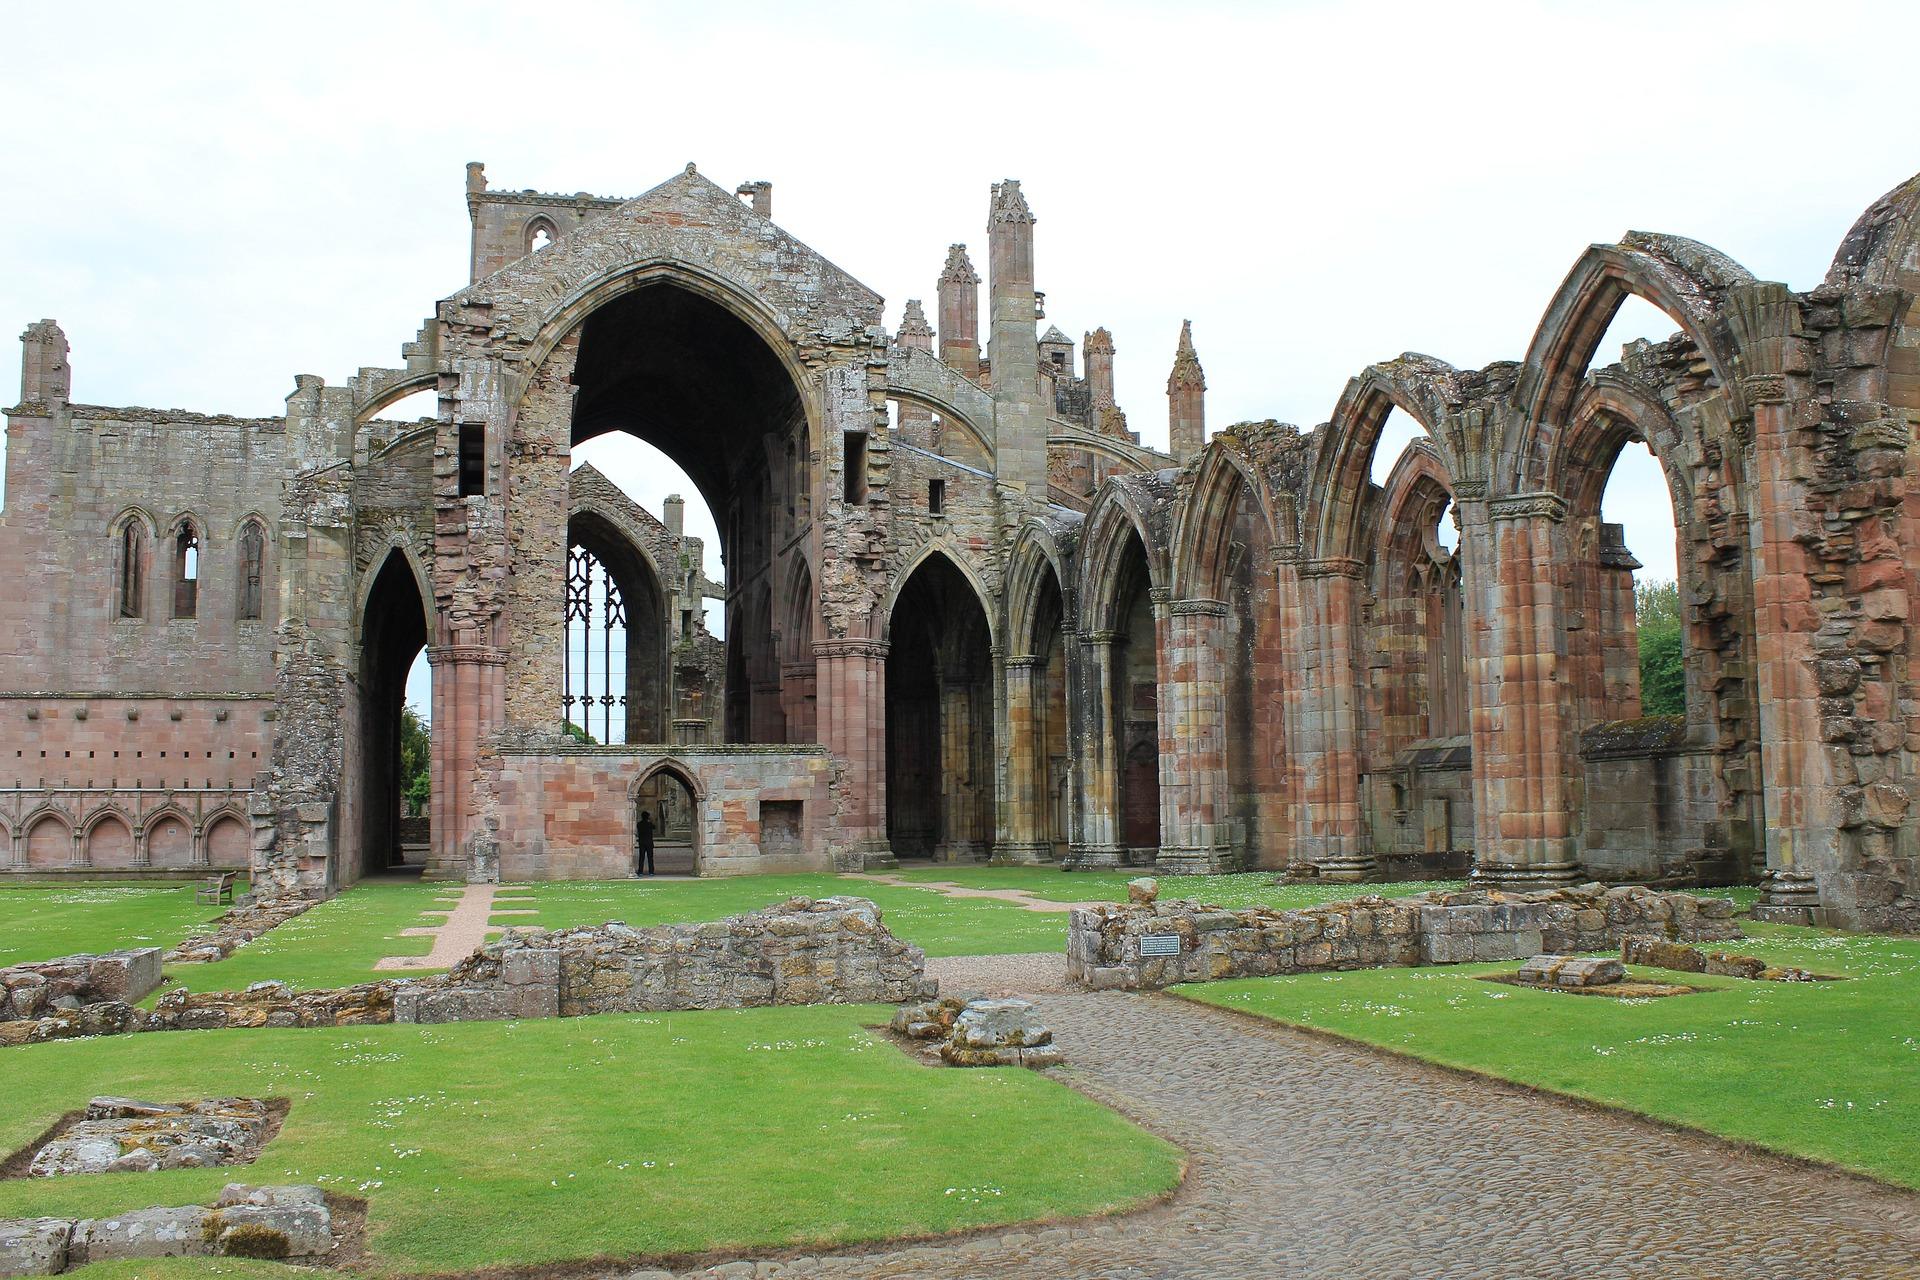 melrose-abbey-2356735_1920.jpg